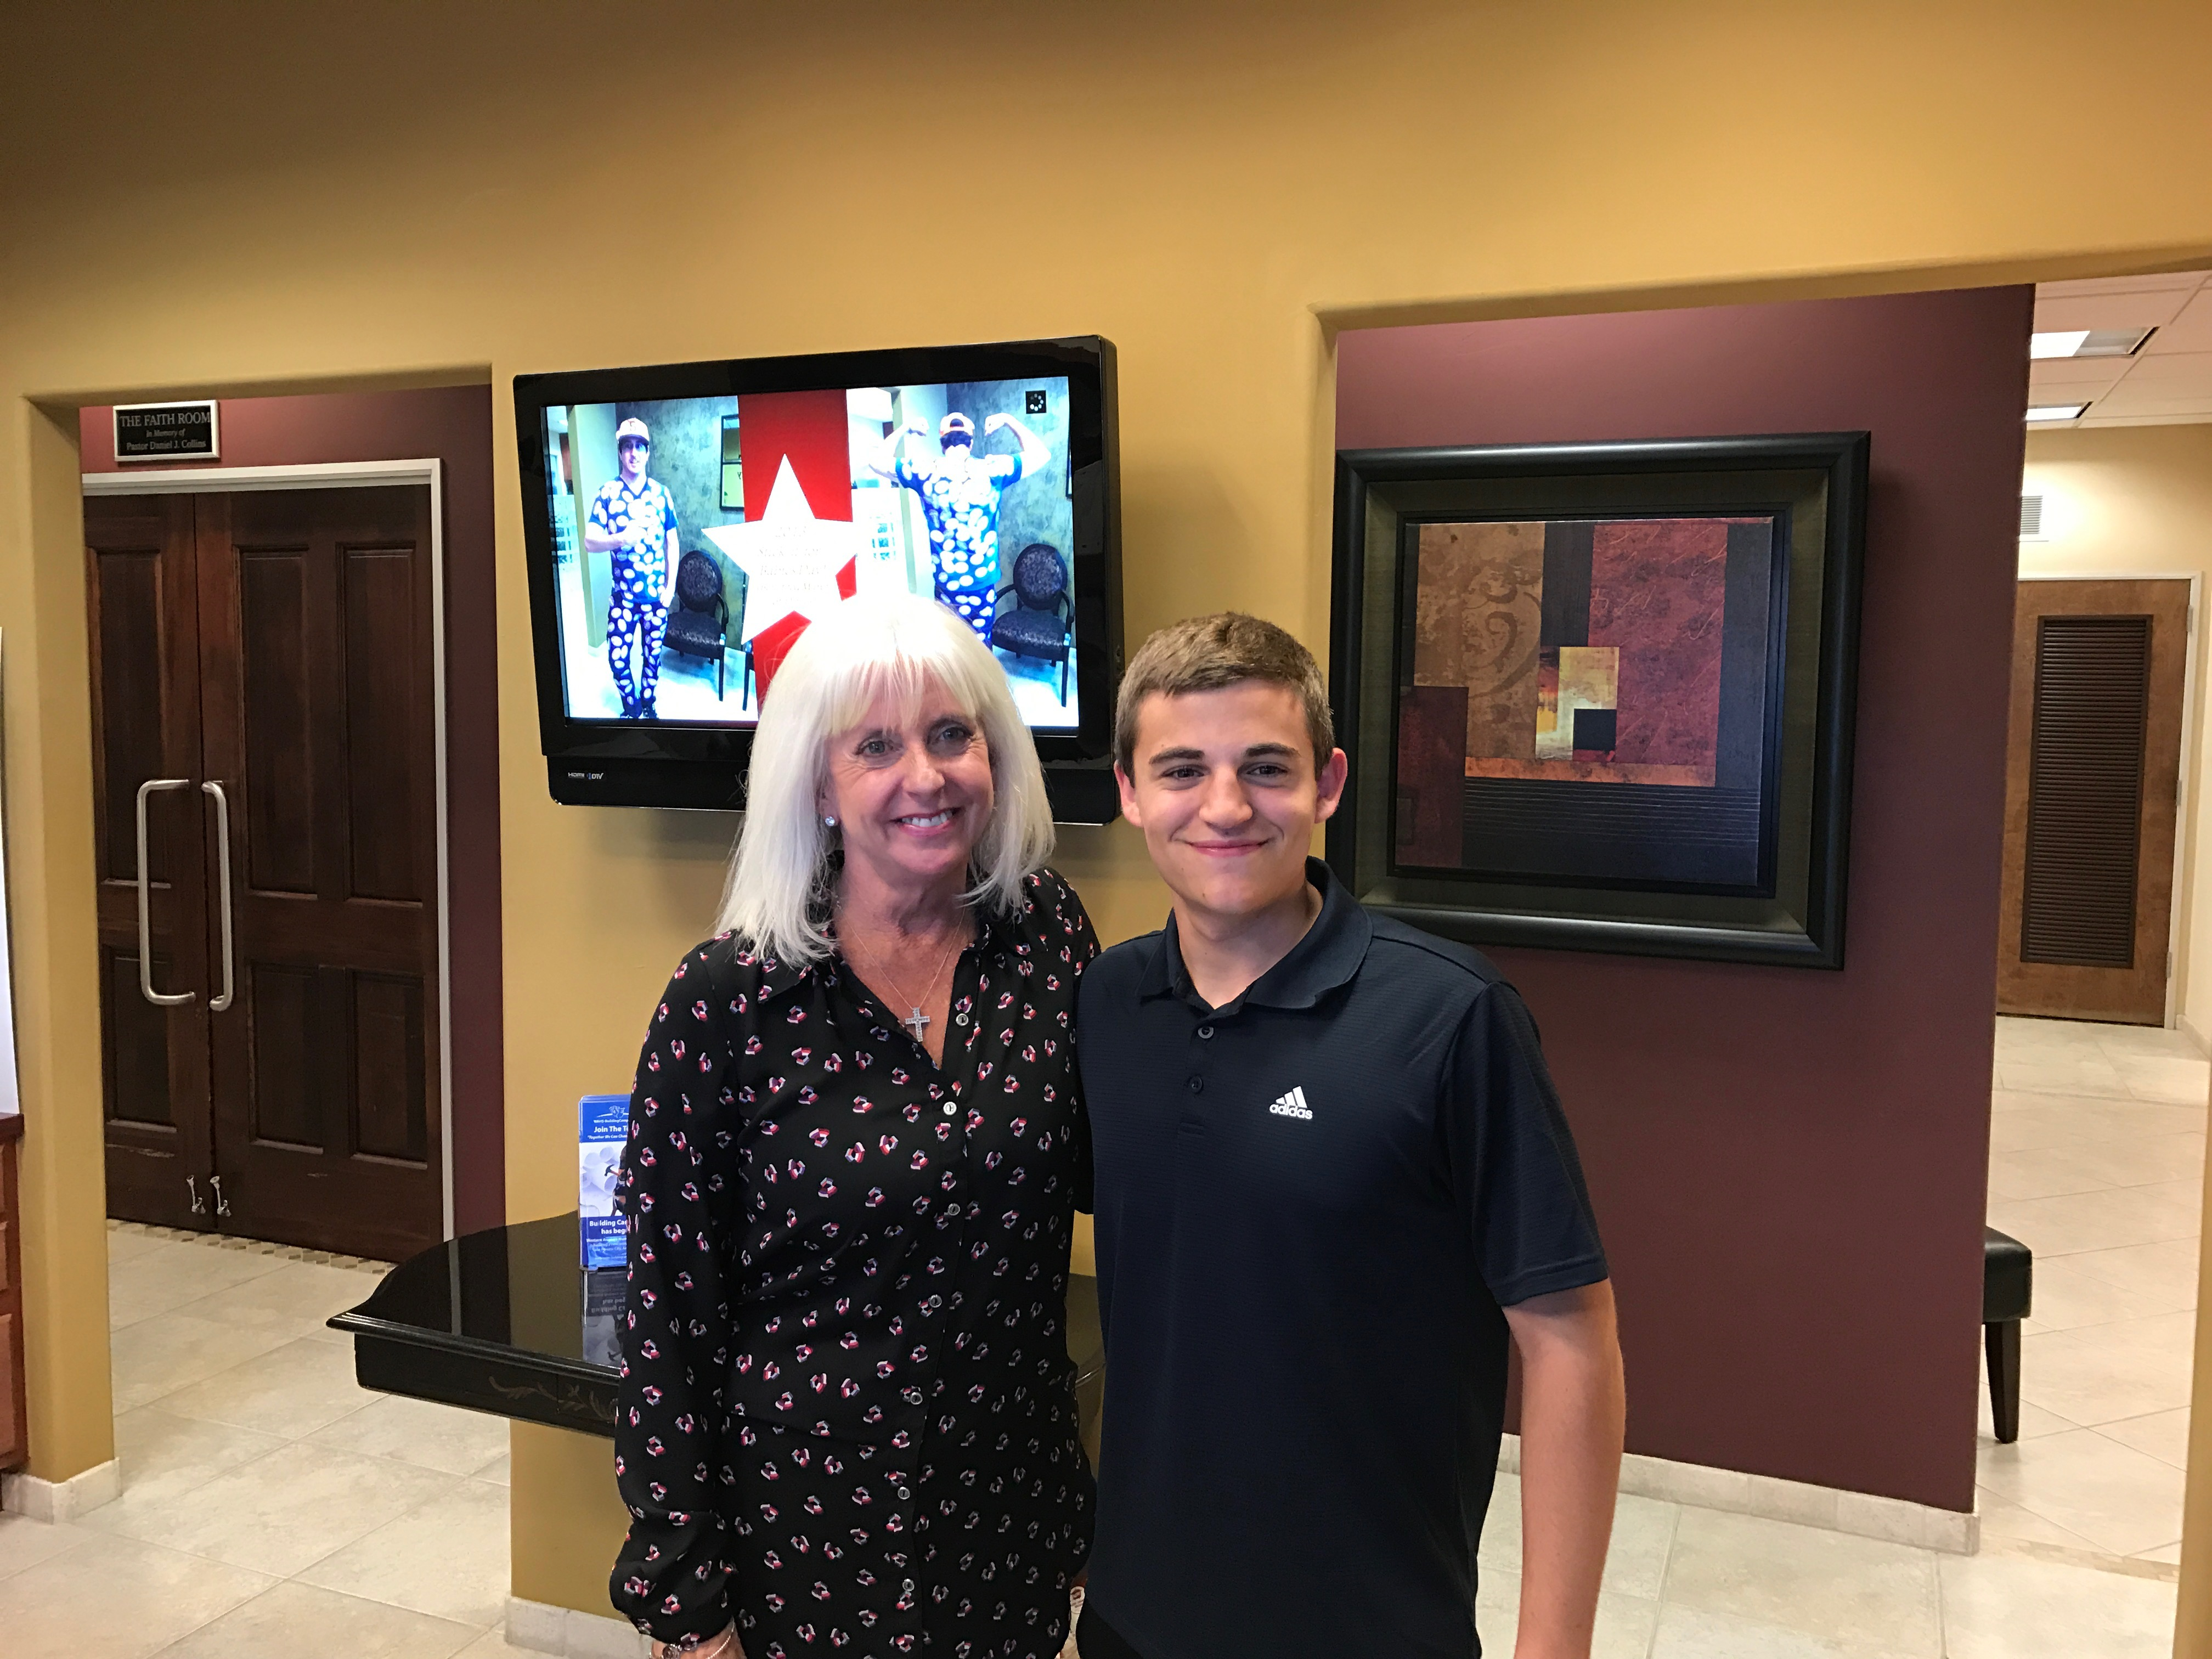 Vicki Runyon- Owner of Keller Williams Arizona Living Realty